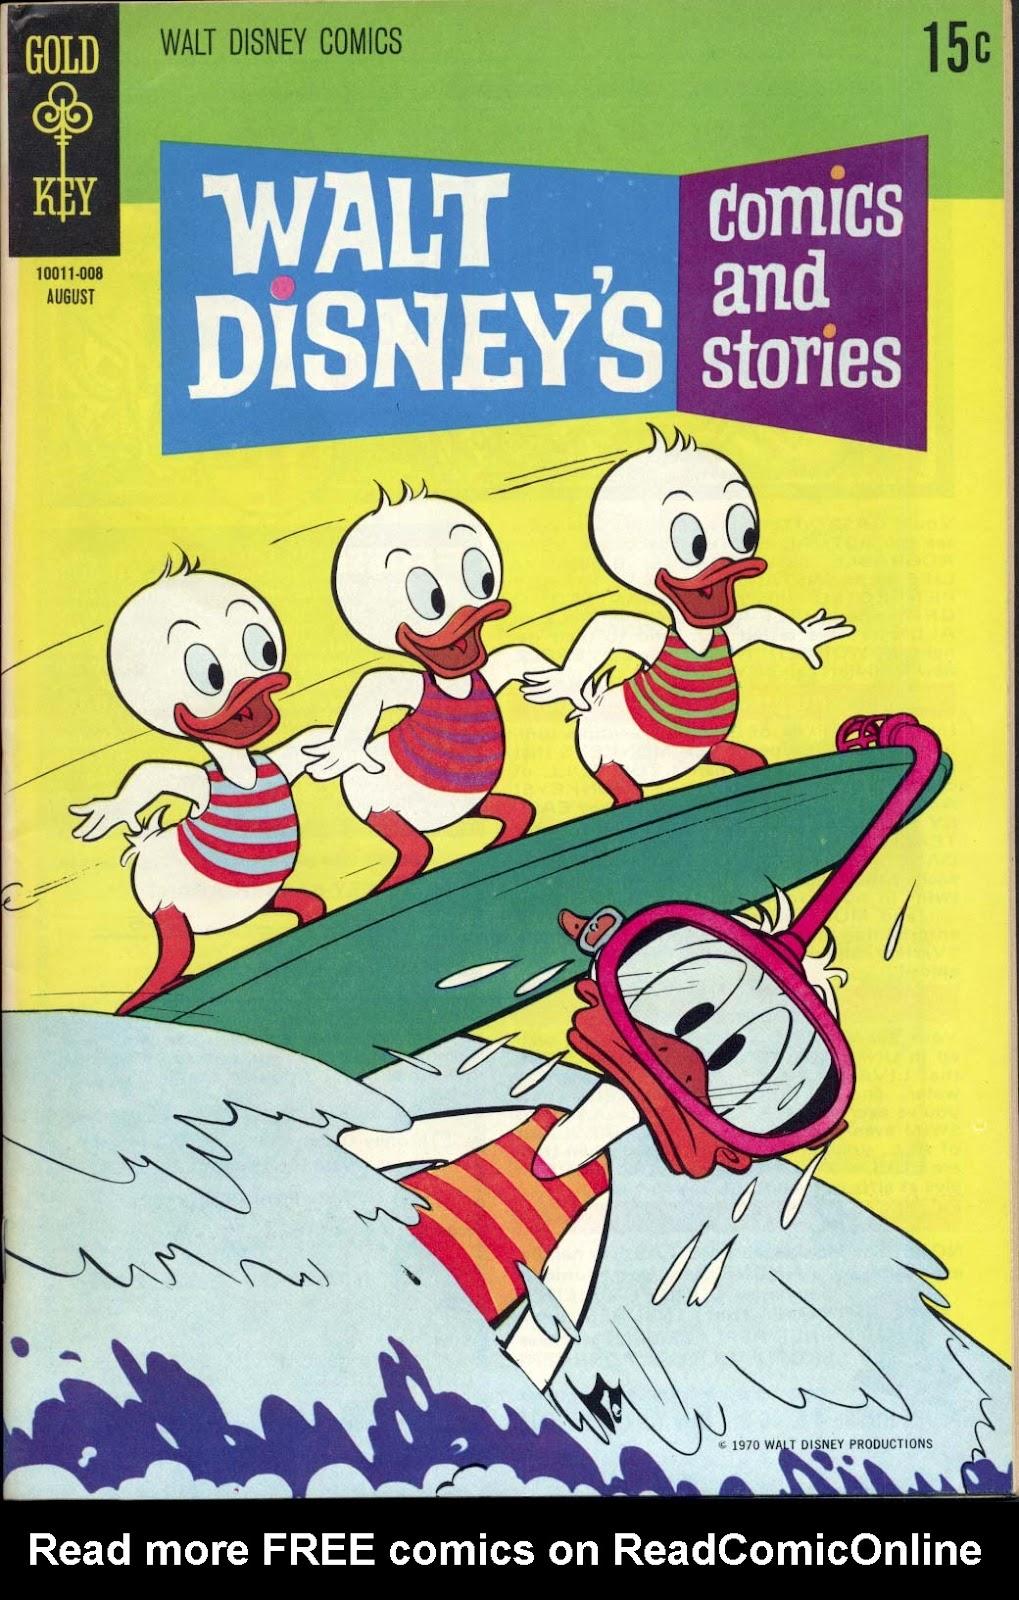 Walt Disneys Comics and Stories 359 Page 1